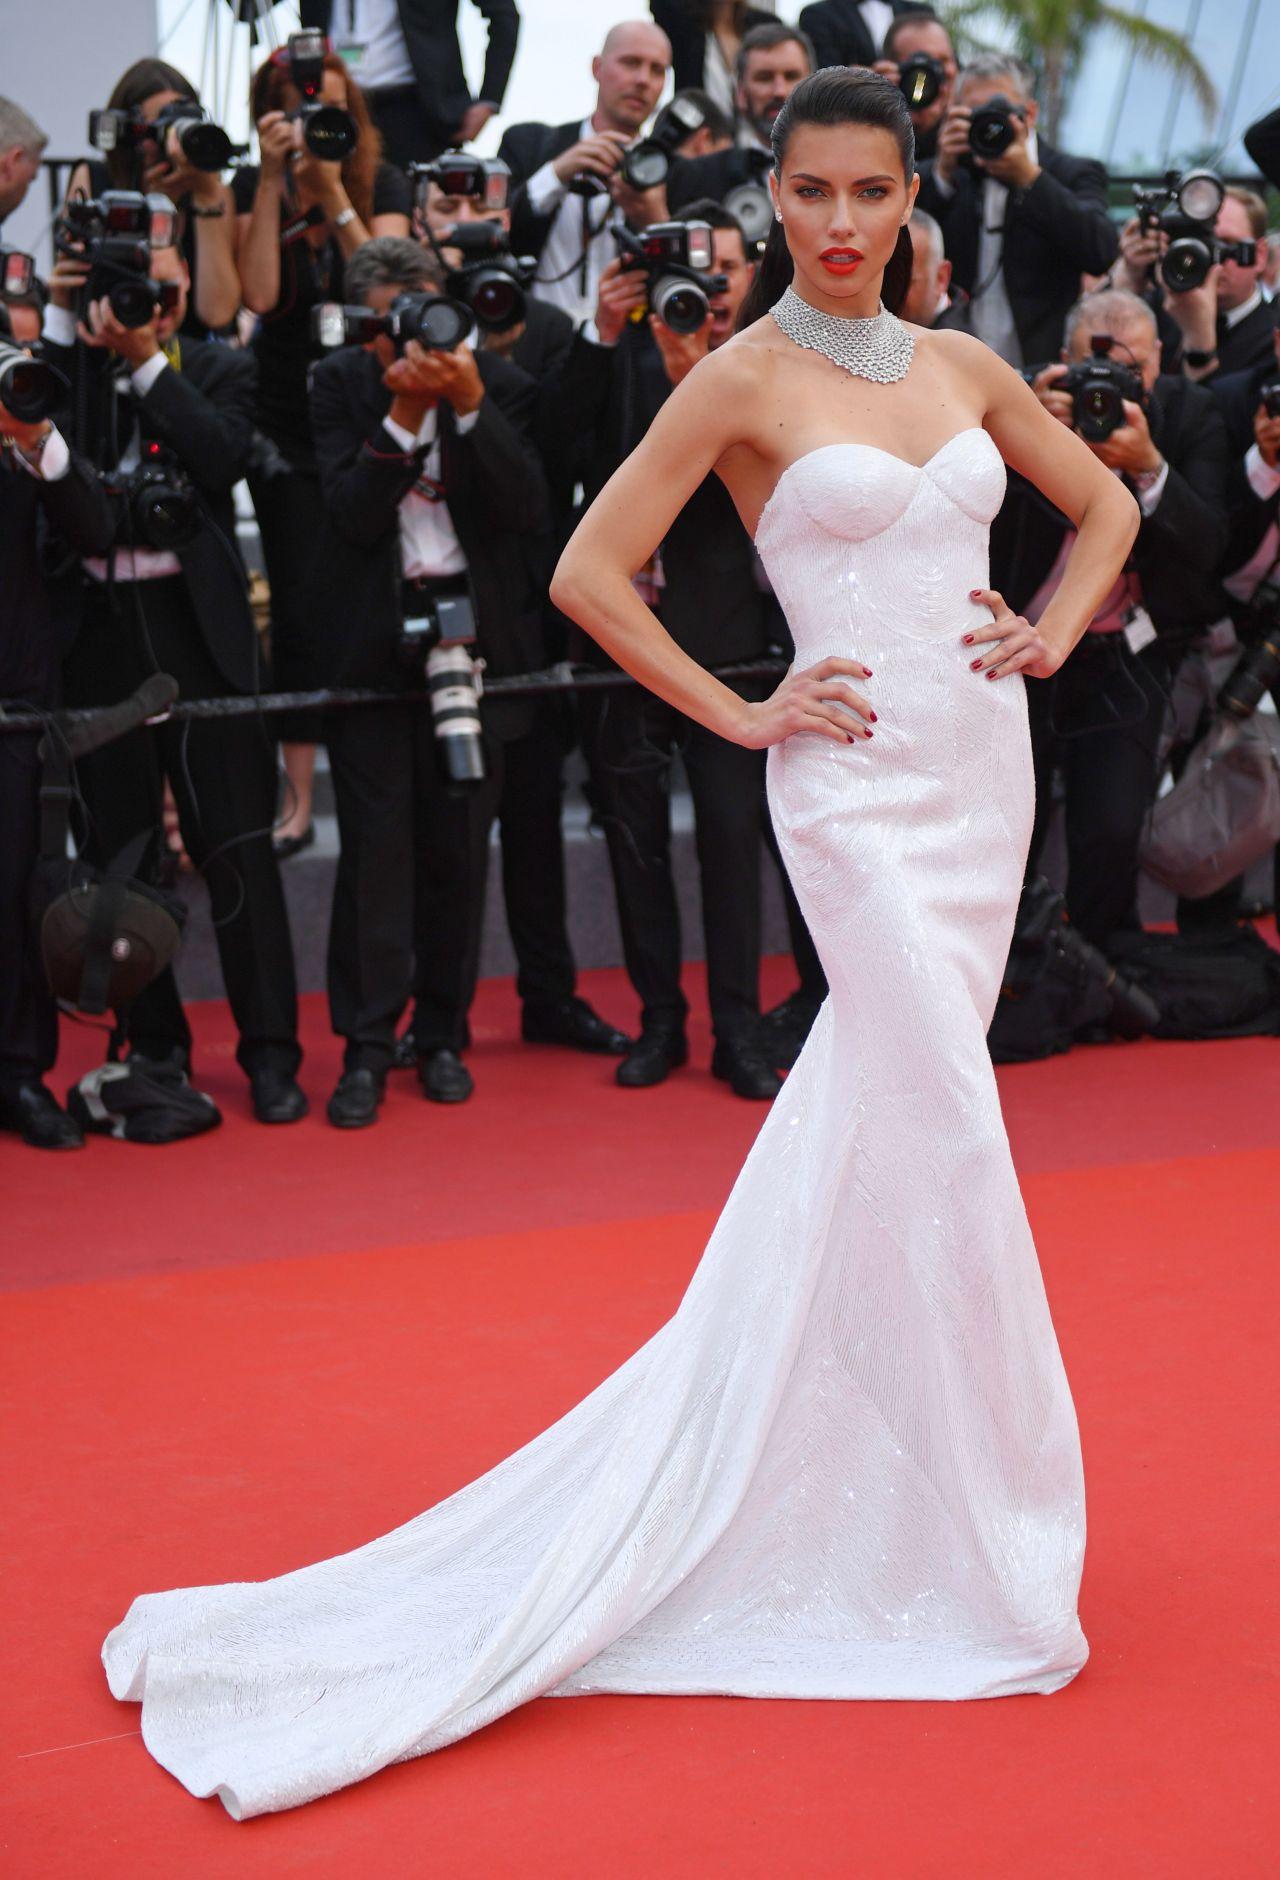 Adriana Lima Loveless Premiere At Cannes Film Festival